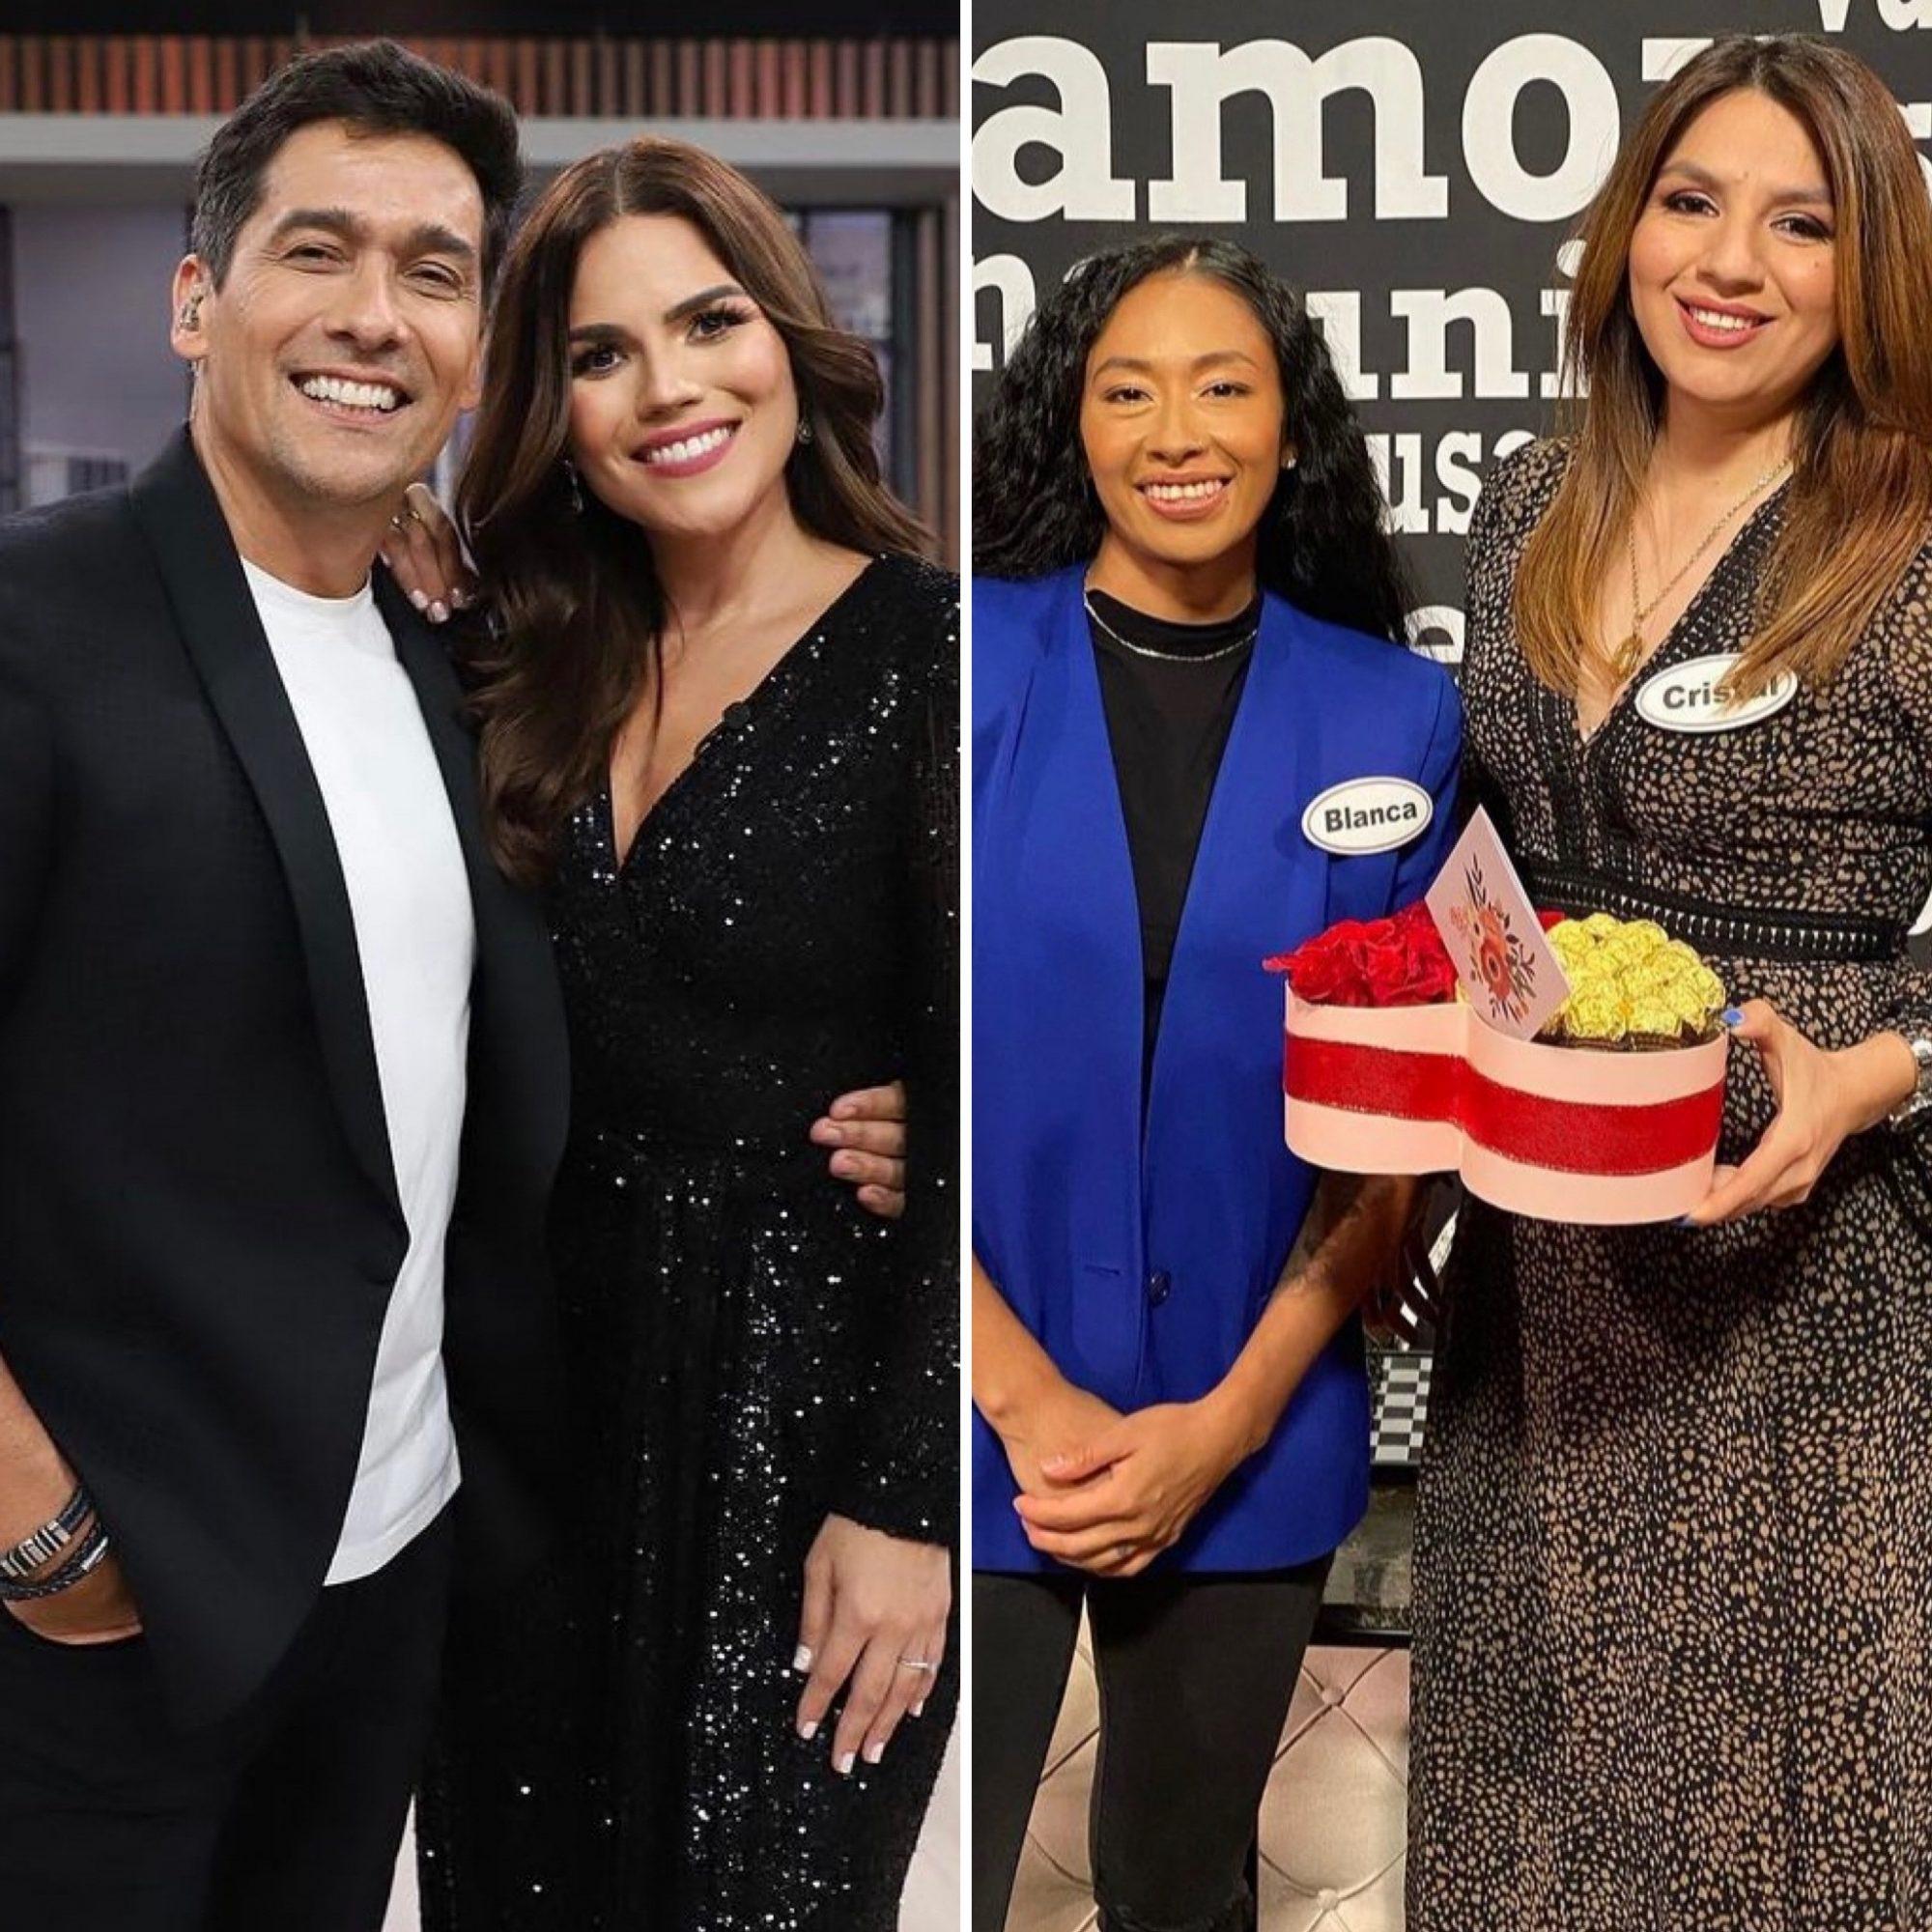 Rafael Araneda y Karina Banda/ Cristal y su flechada Blanca